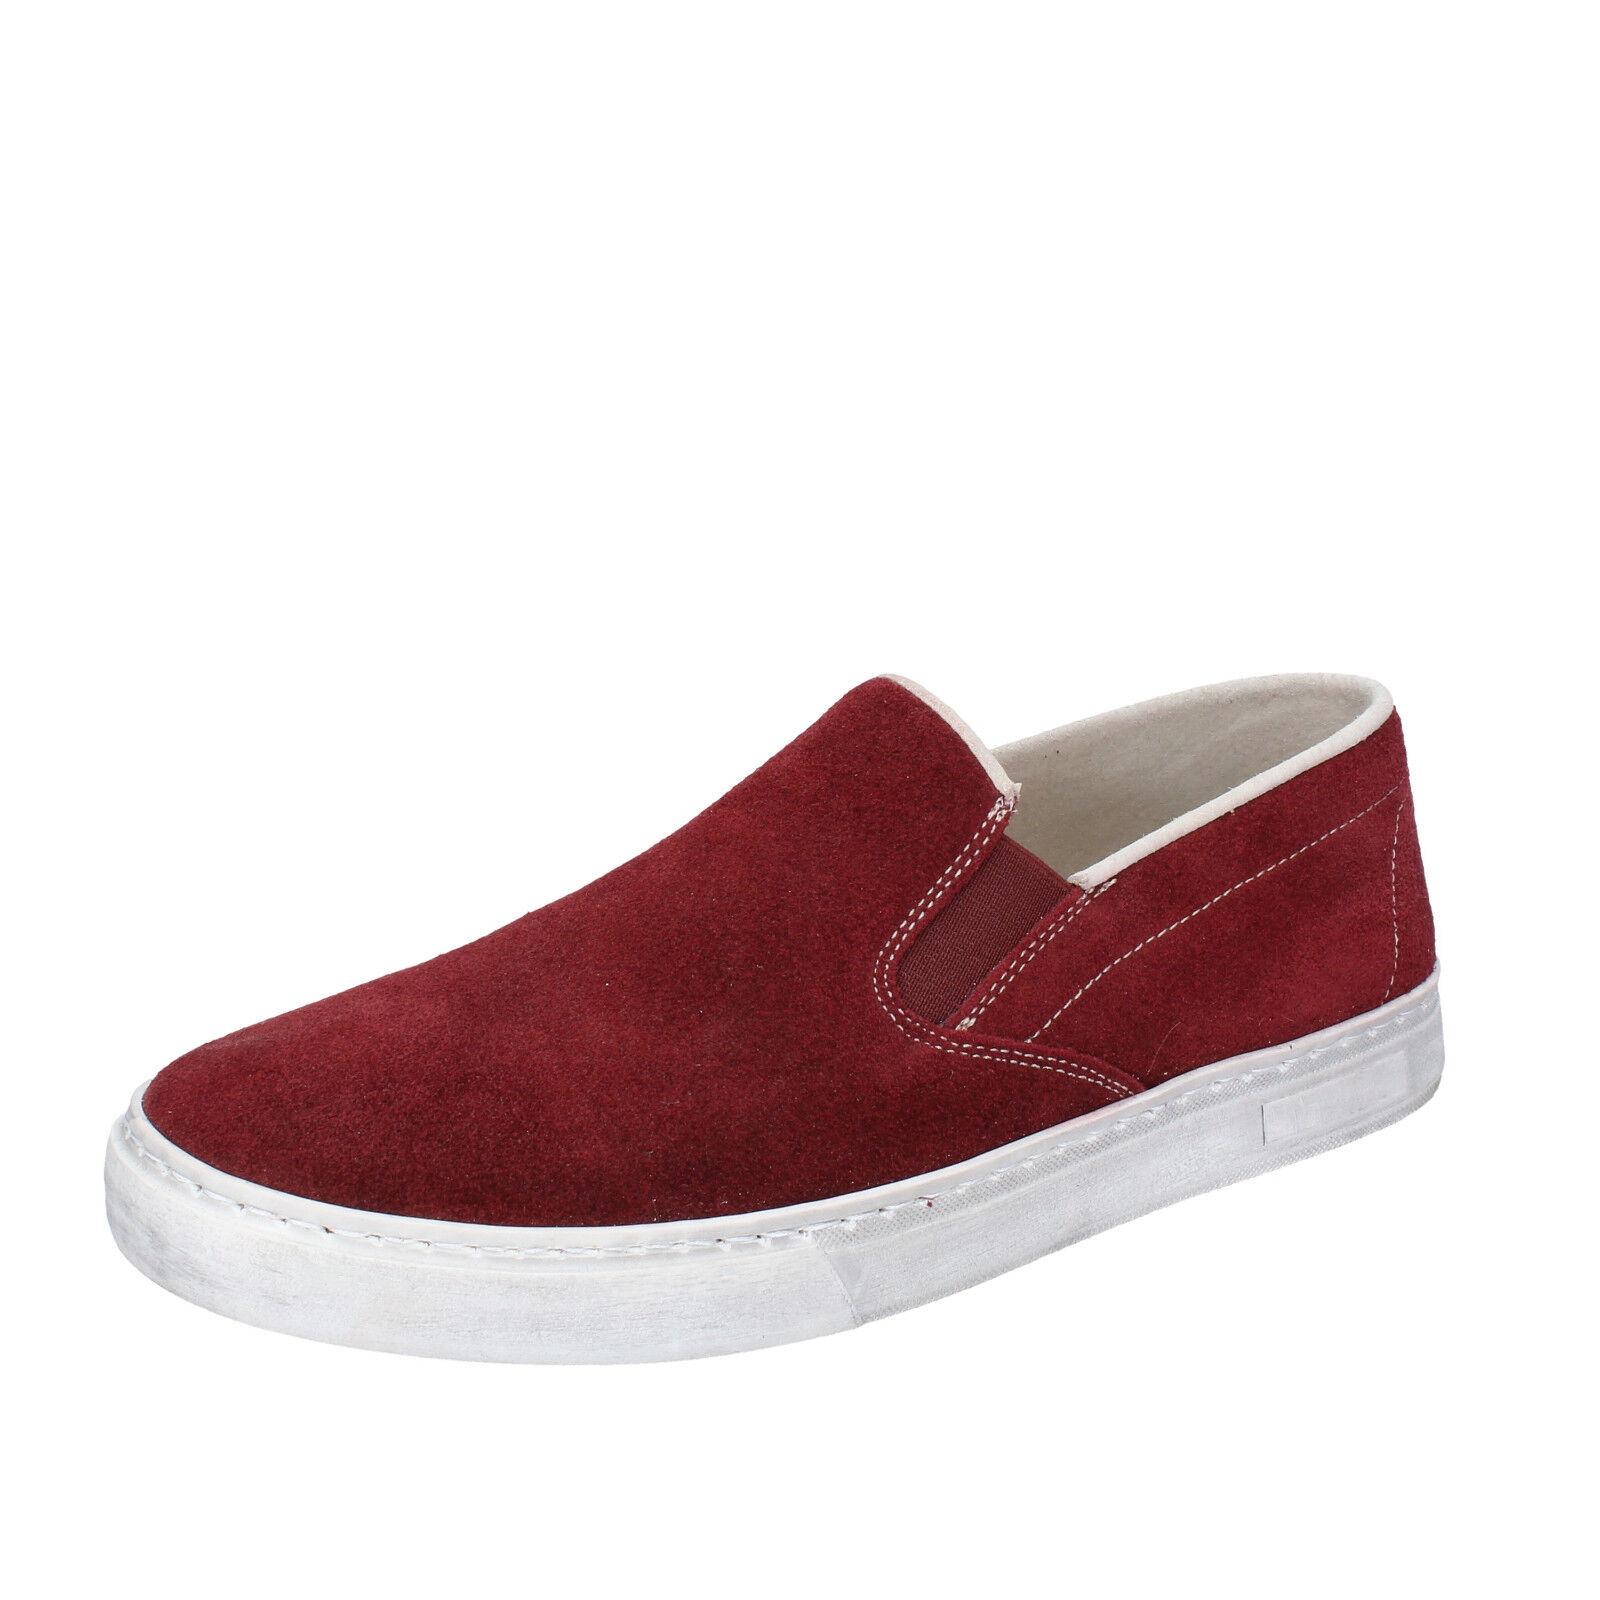 scarpe uomo NYON BY CORAF 40 slip on bordeaux camoscio BZ901-C